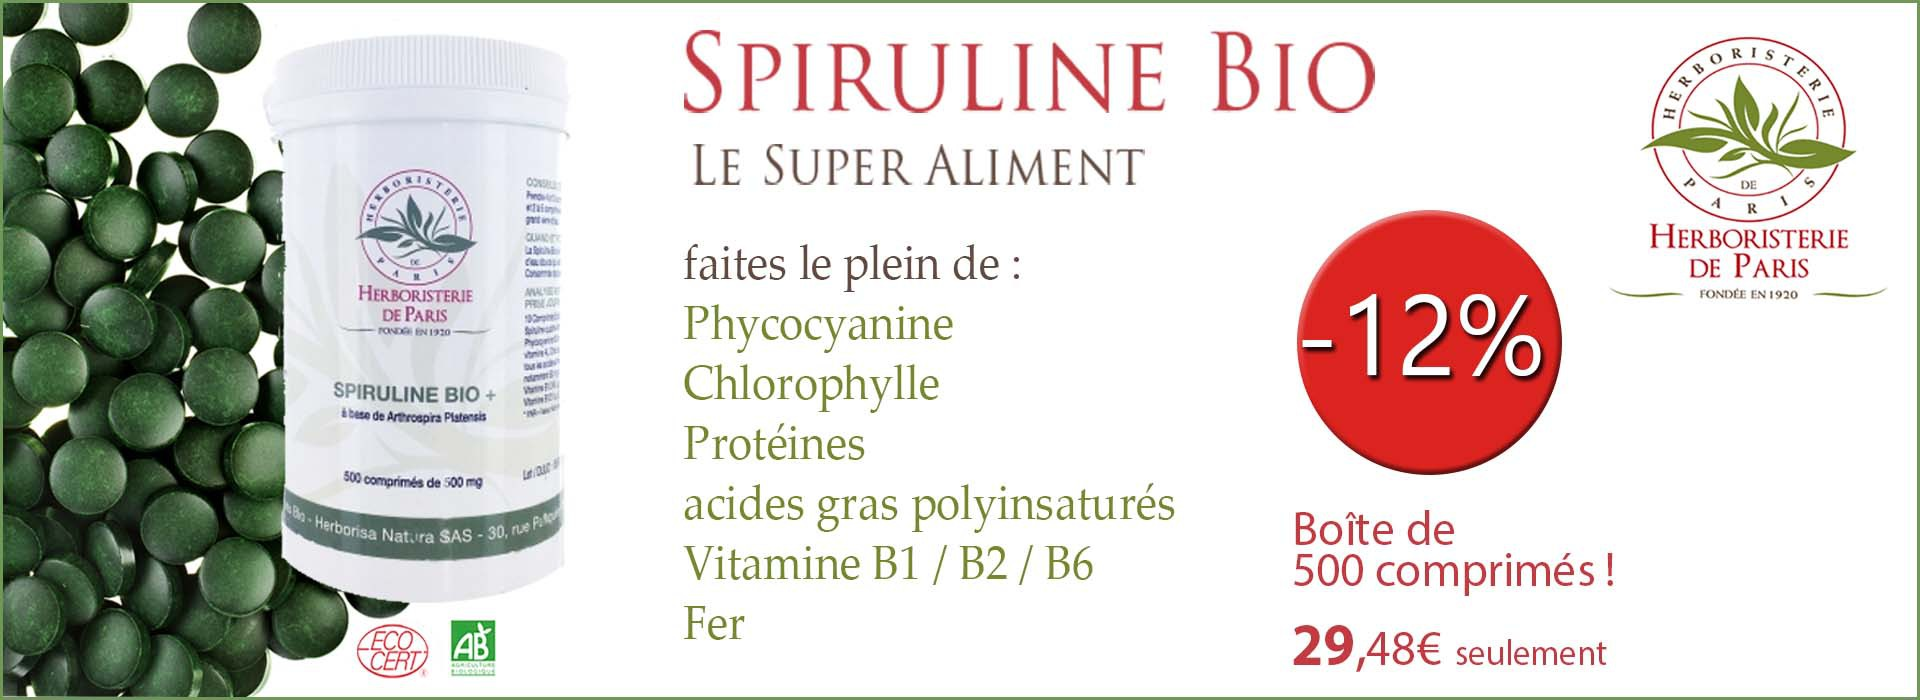 spiruline bio Herboristerie de Paris